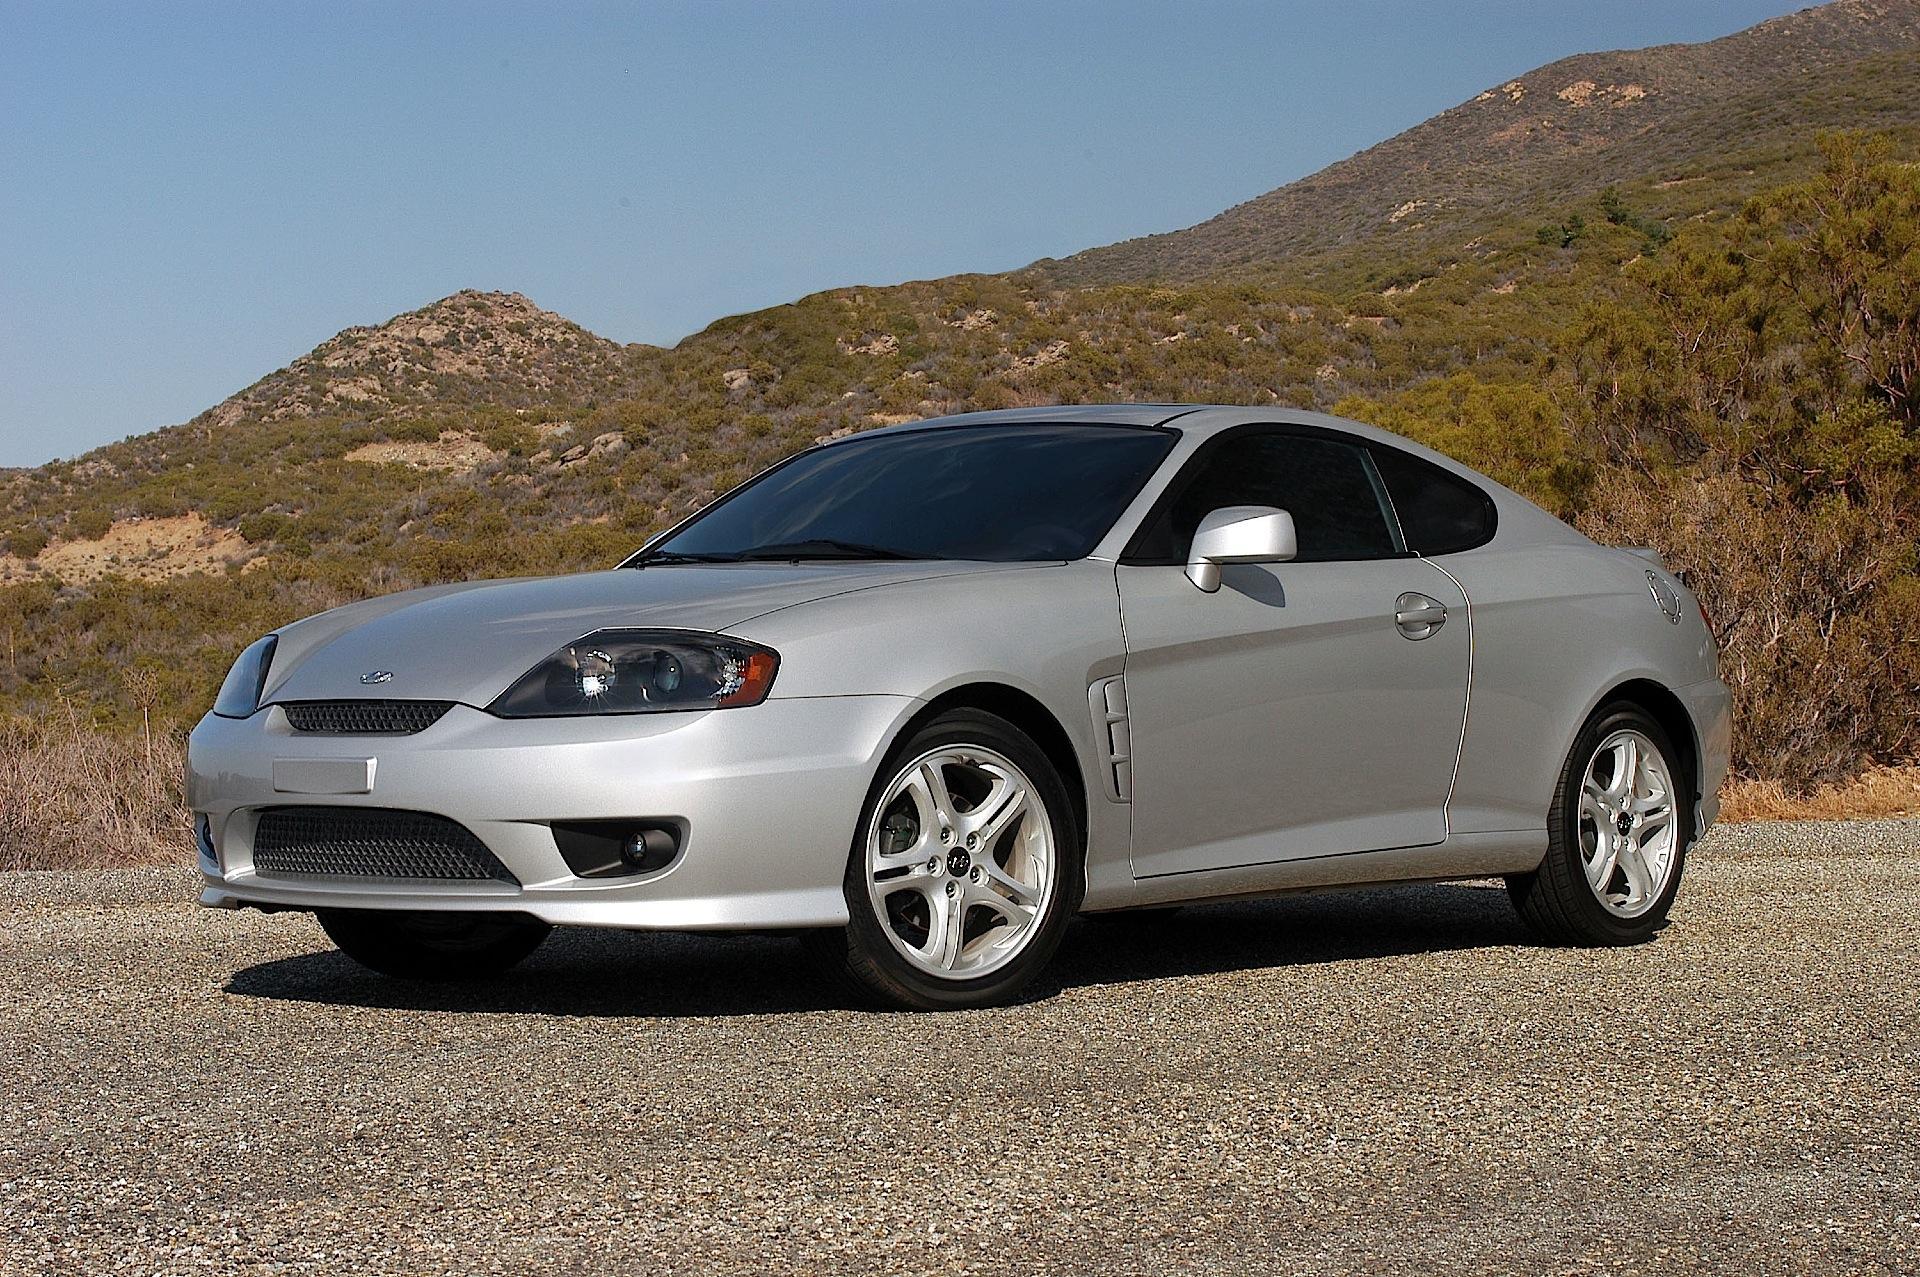 2005 Hyundai Tiburon Gt >> HYUNDAI Coupe / Tiburon - 2004, 2005, 2006, 2007 ...